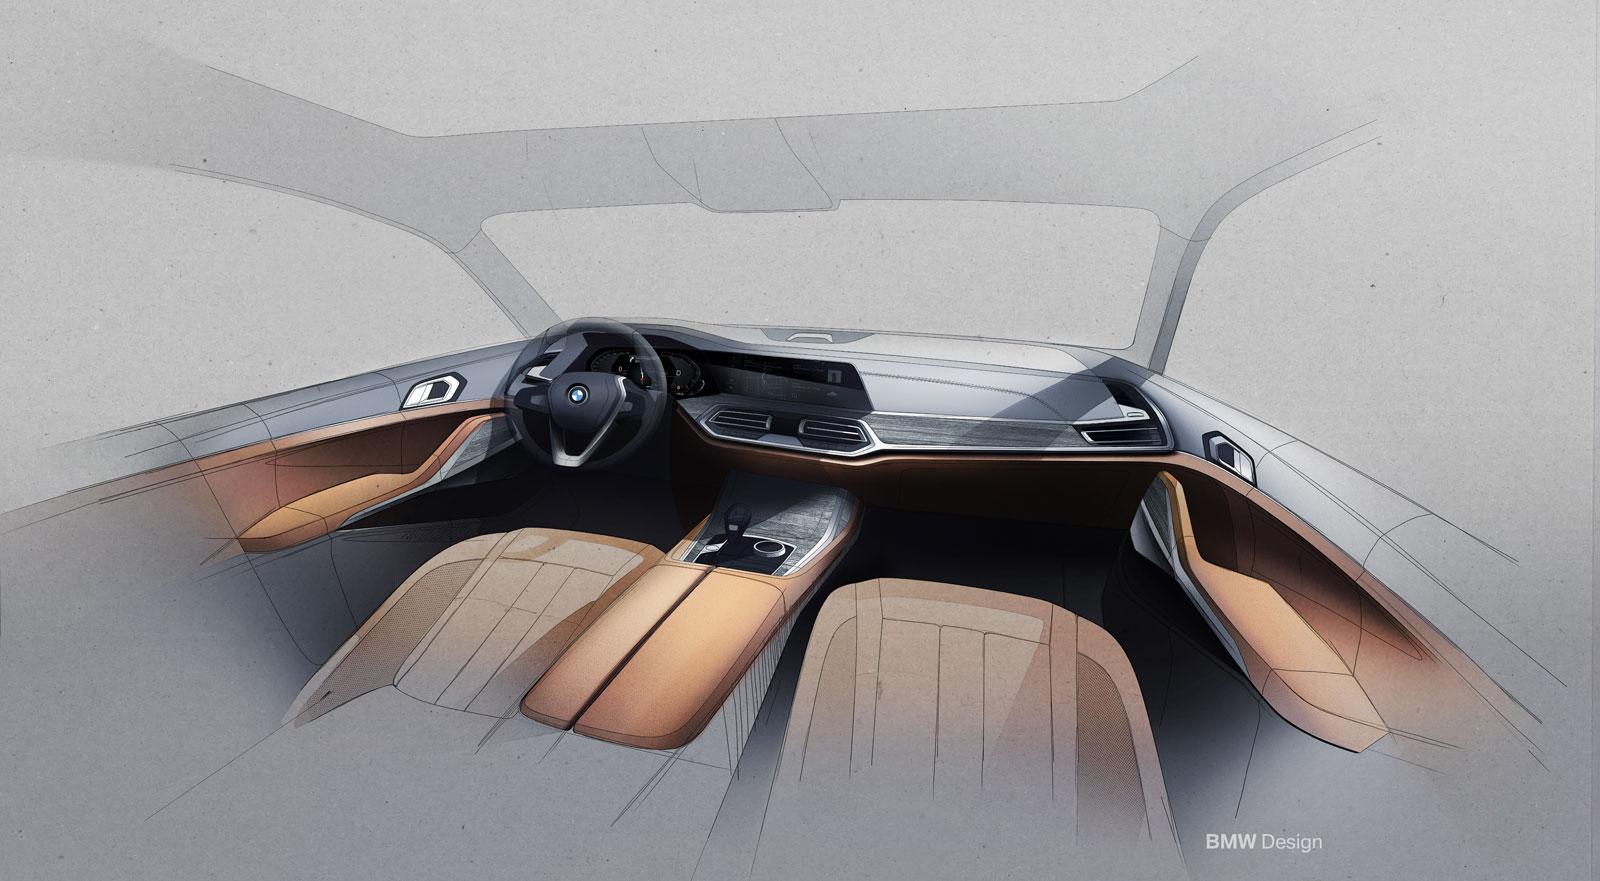 Bmw X7 Interior Design Sketch Render Car Body Design